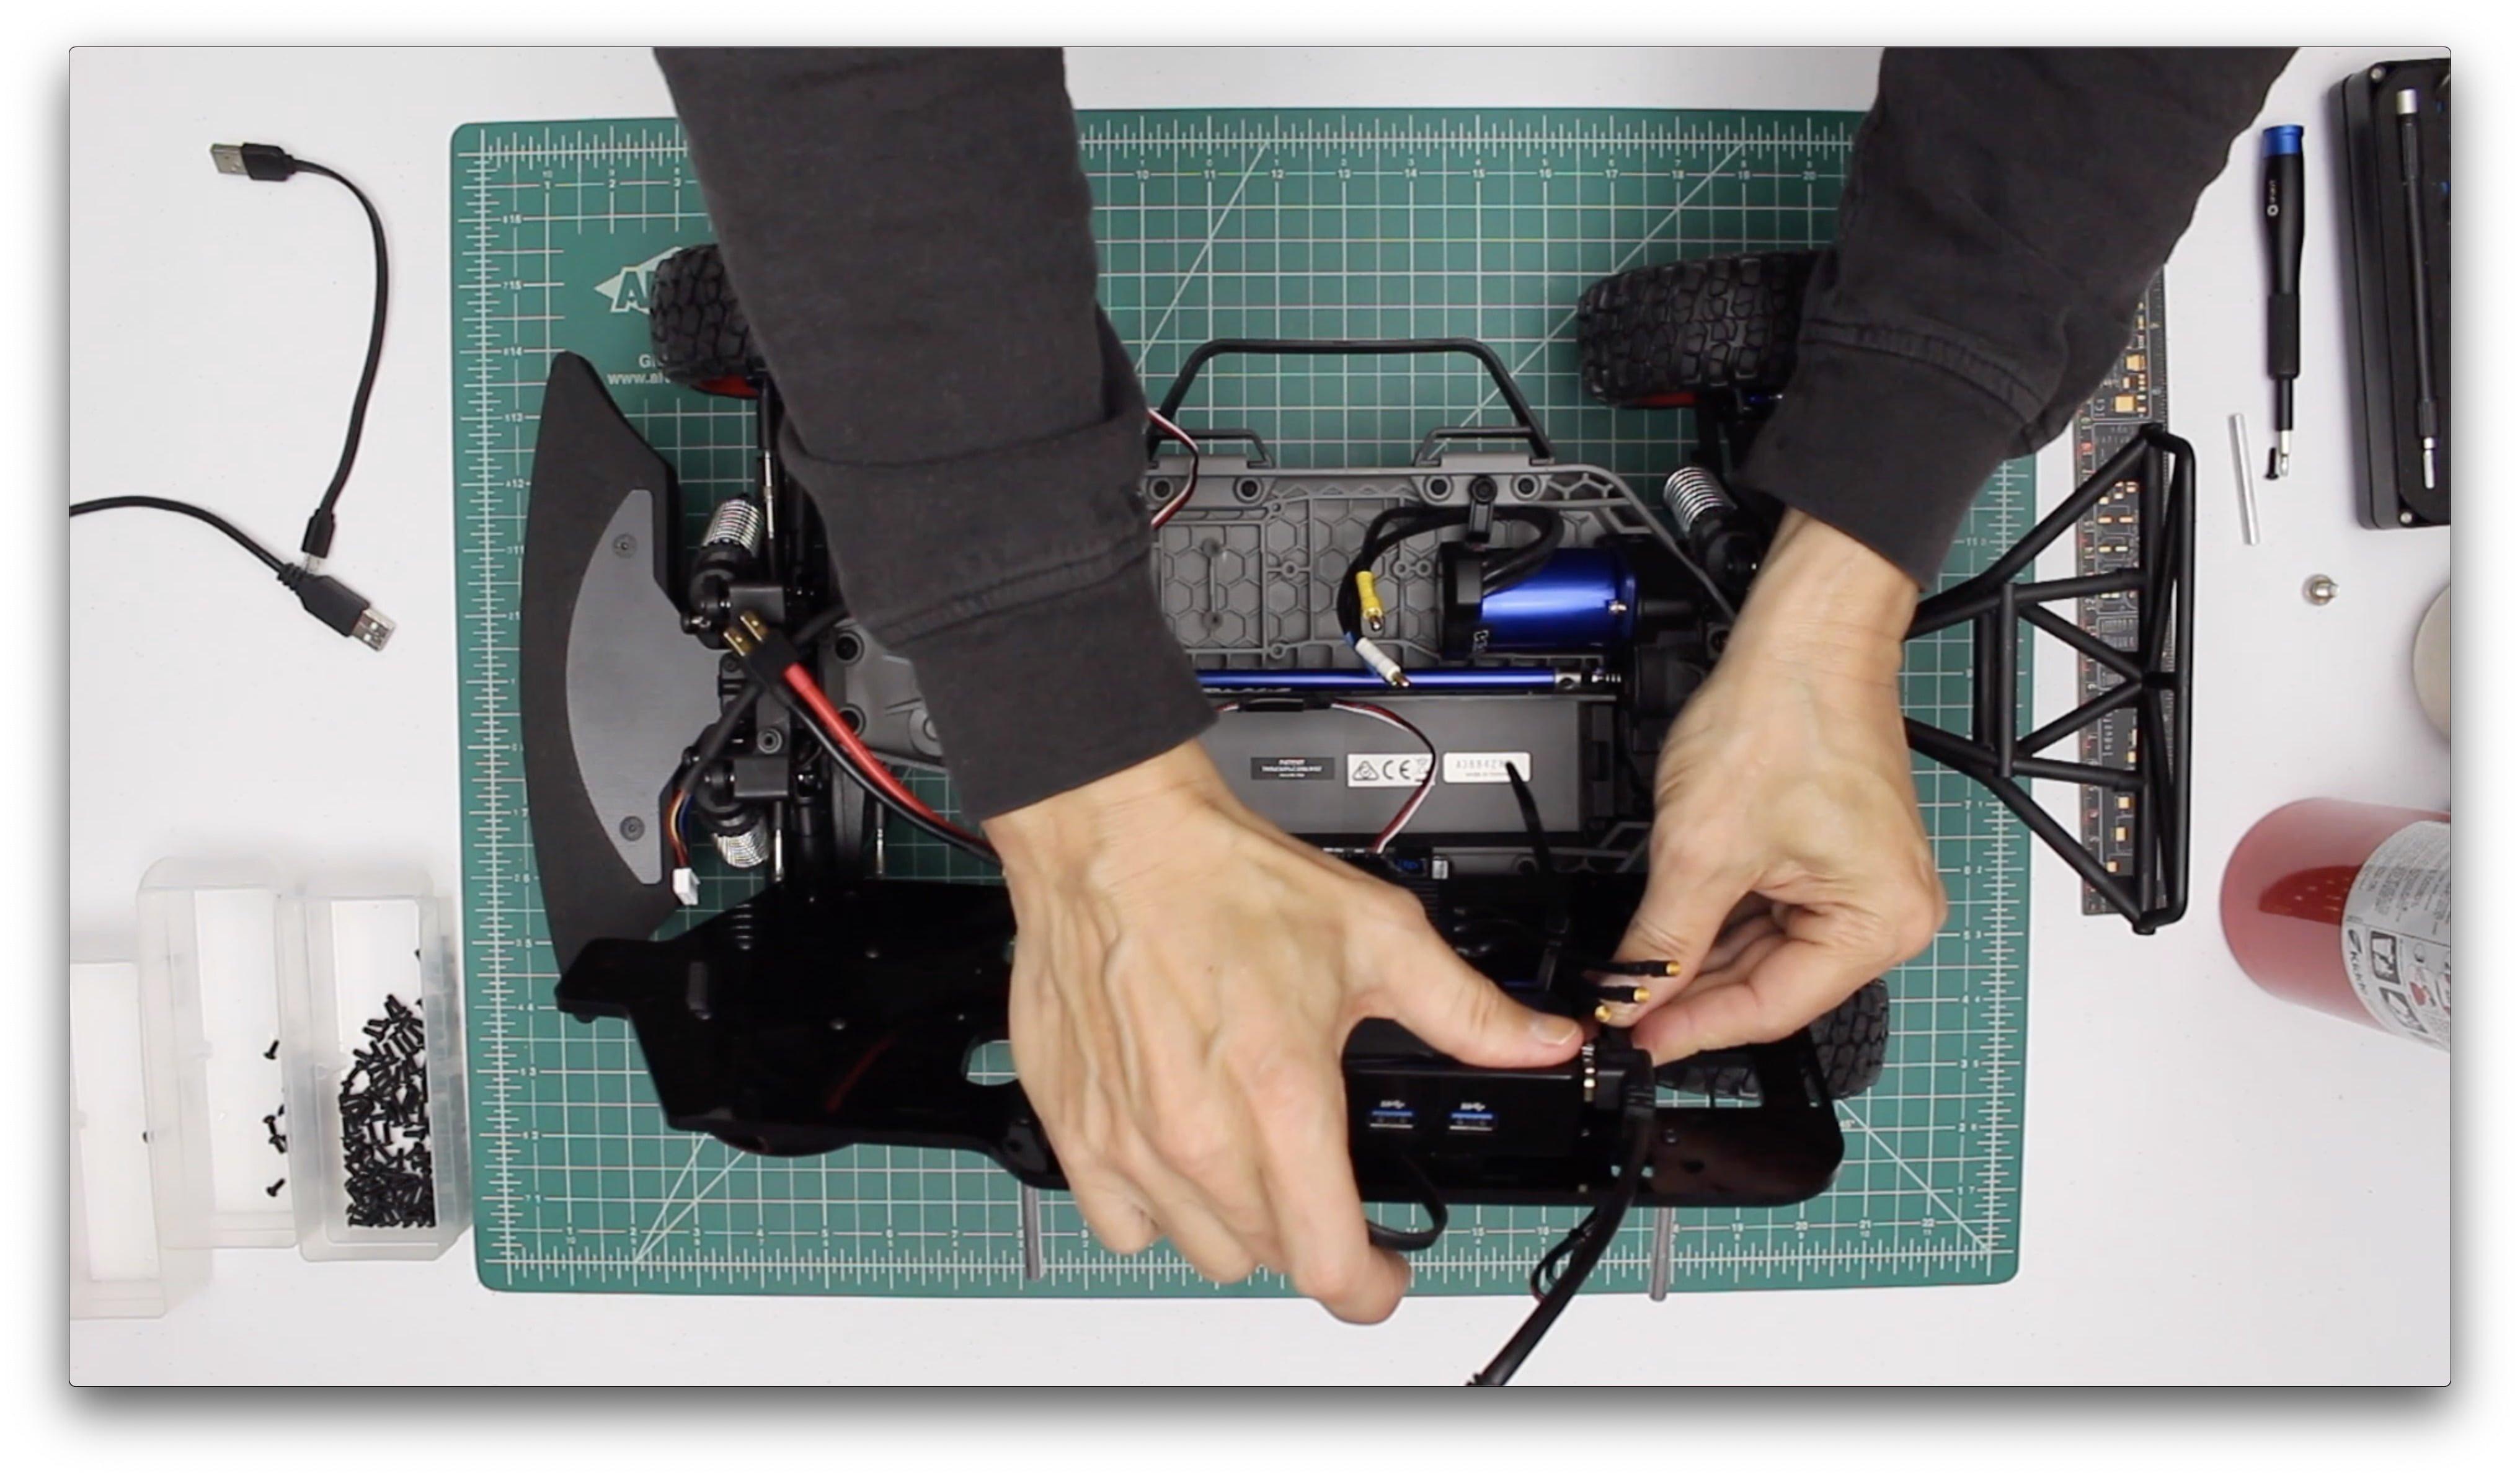 USB Hub Power Cable